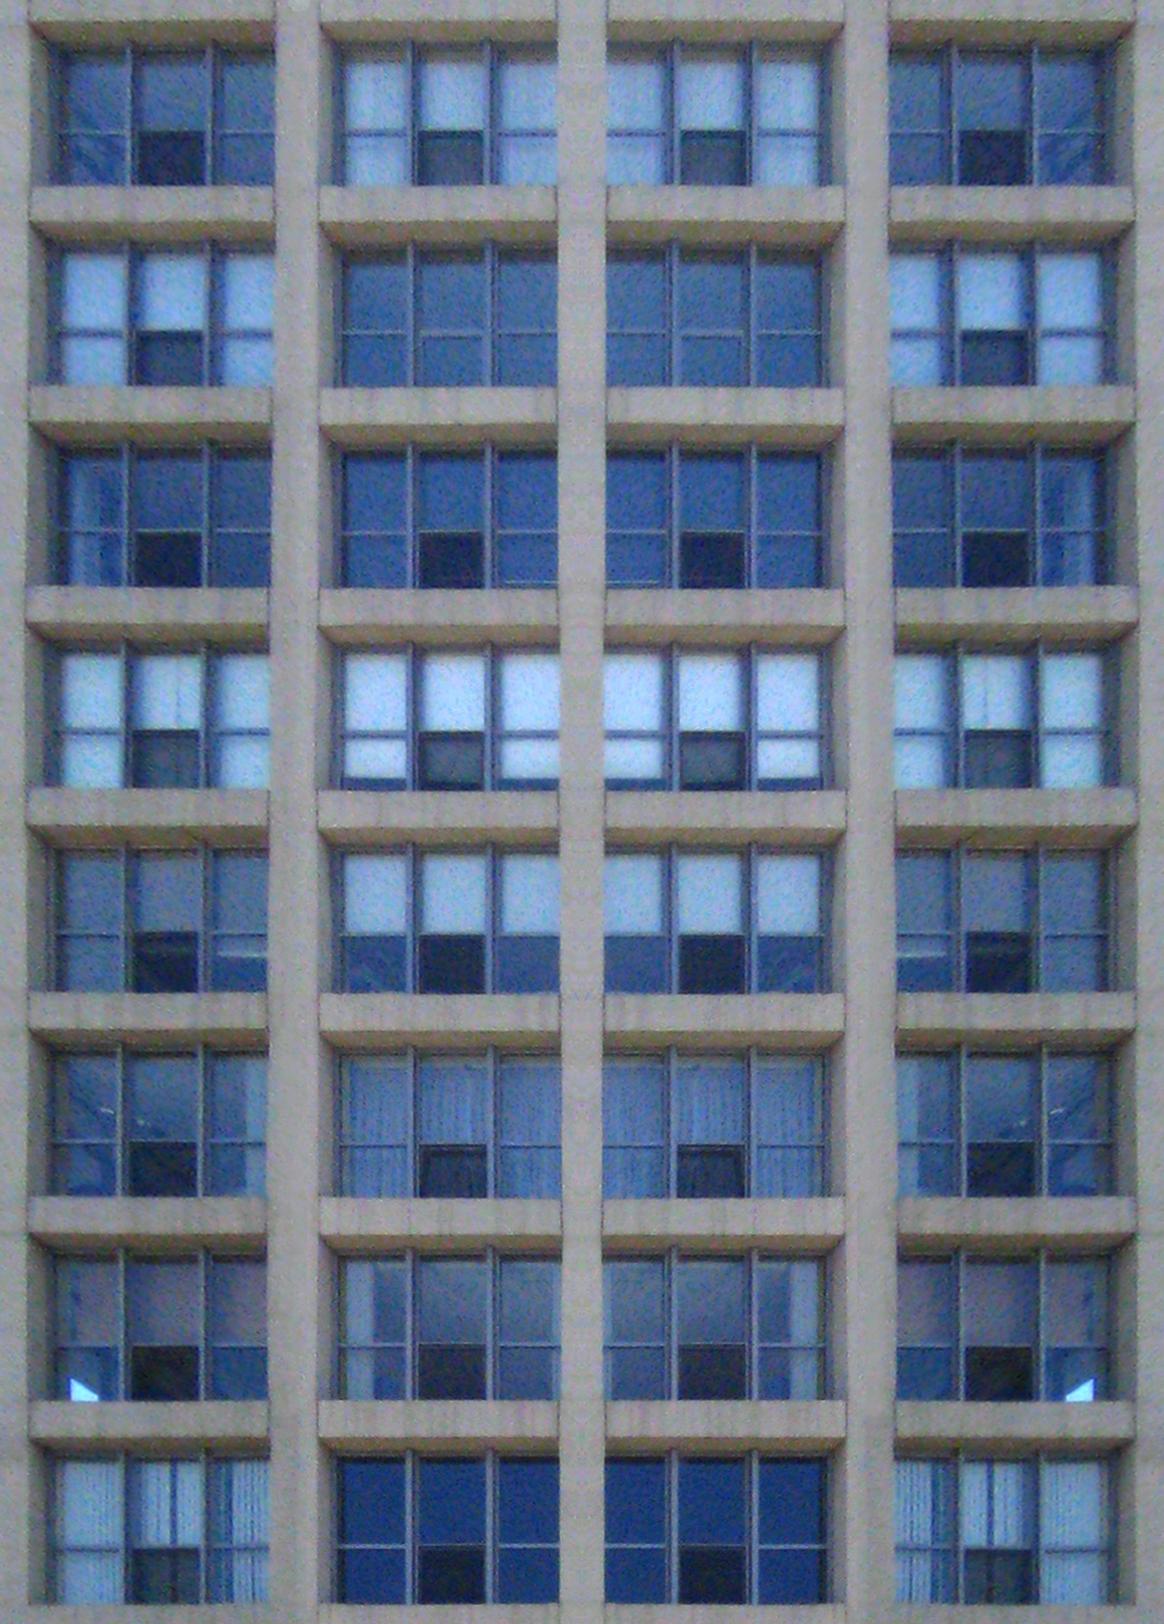 Building facade